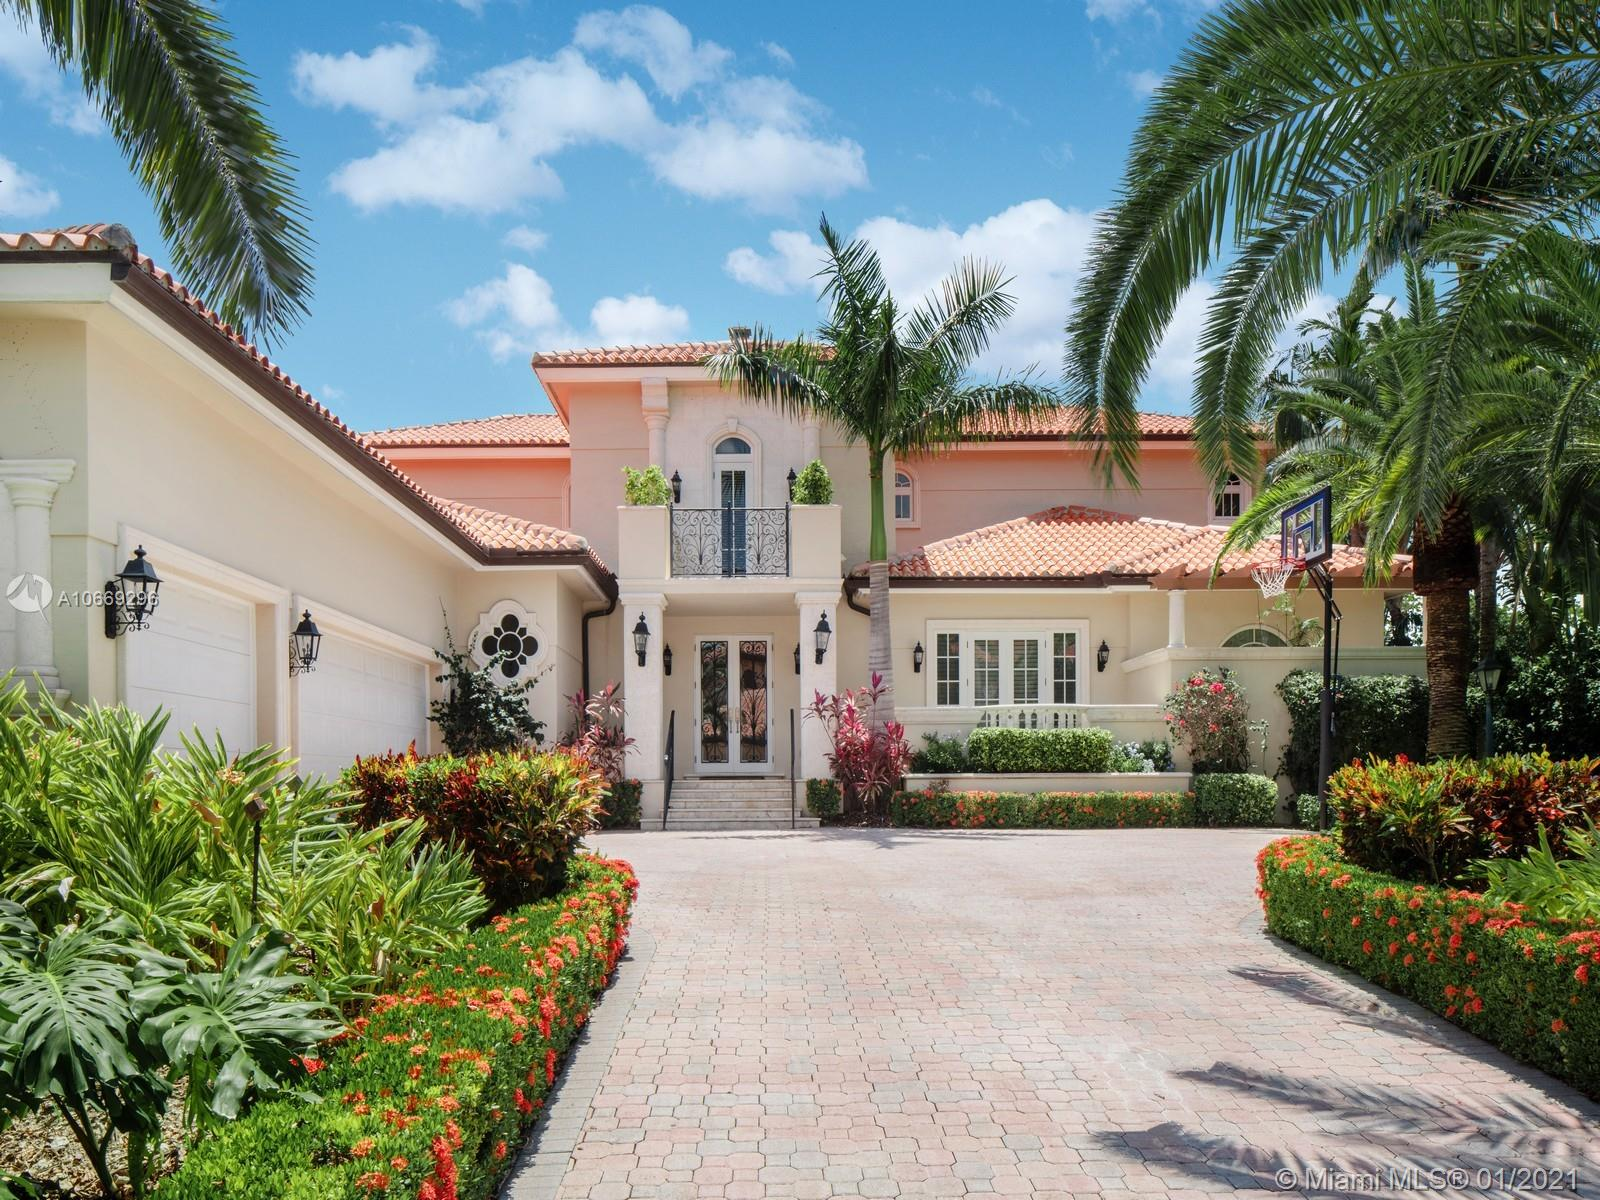 13678 DEERING BAY DR, Coral Gables, Florida 33158, 5 Bedrooms Bedrooms, ,6 BathroomsBathrooms,Residential,For Sale,13678 DEERING BAY DR,A10669296